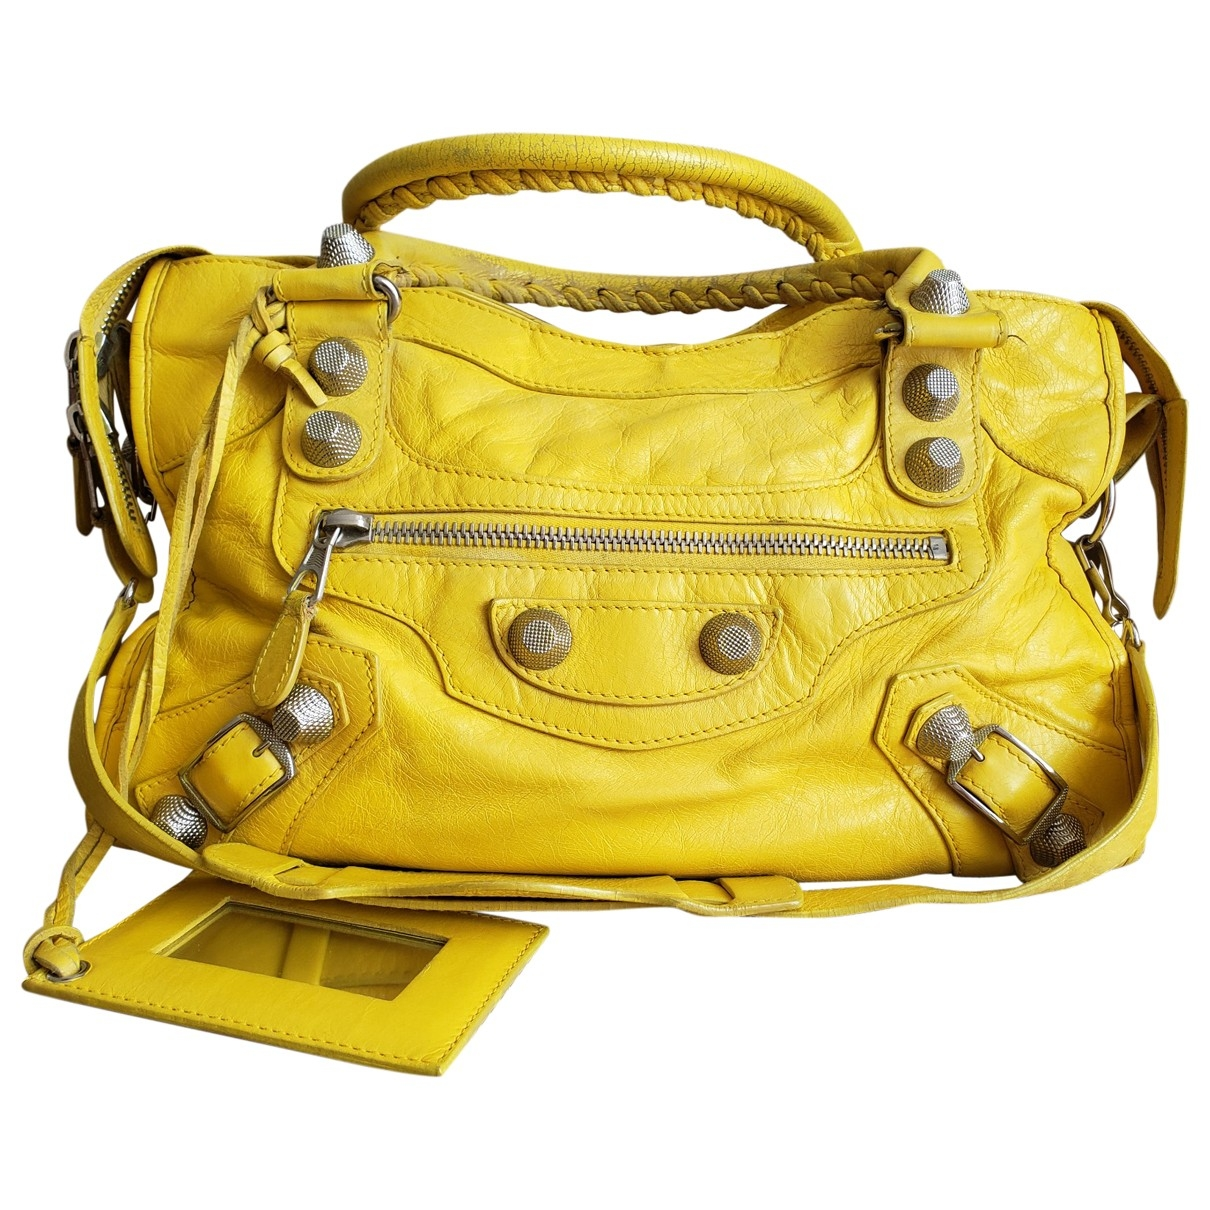 Balenciaga City Yellow Leather handbag for Women \N